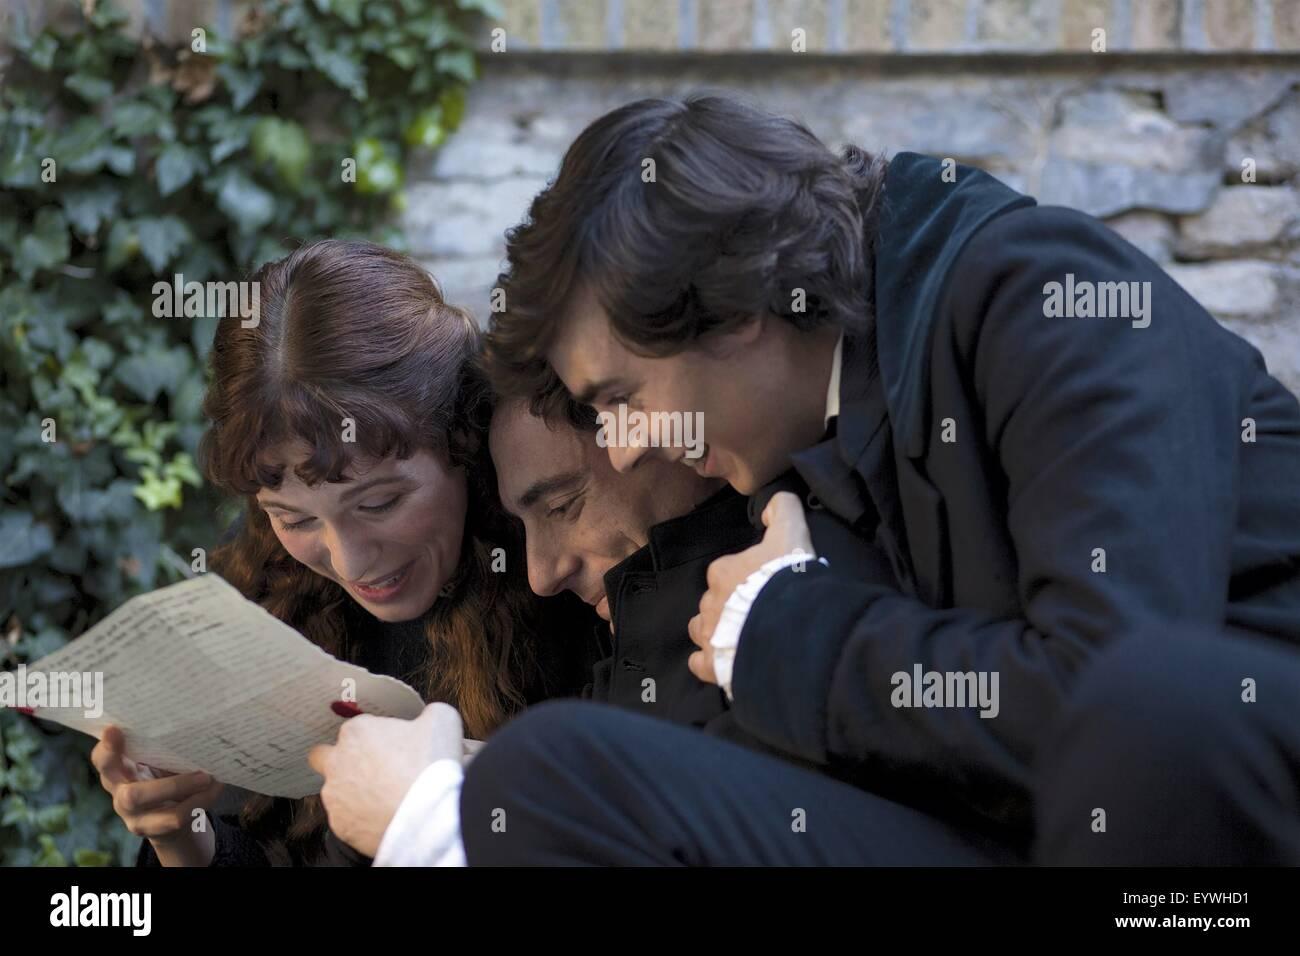 Leopardi ; Il Giovane Favoloso ; Year : 2014 Italy ; Director : Mario Martone ; Isabella Ragonese, Elio Germano, - Stock Image